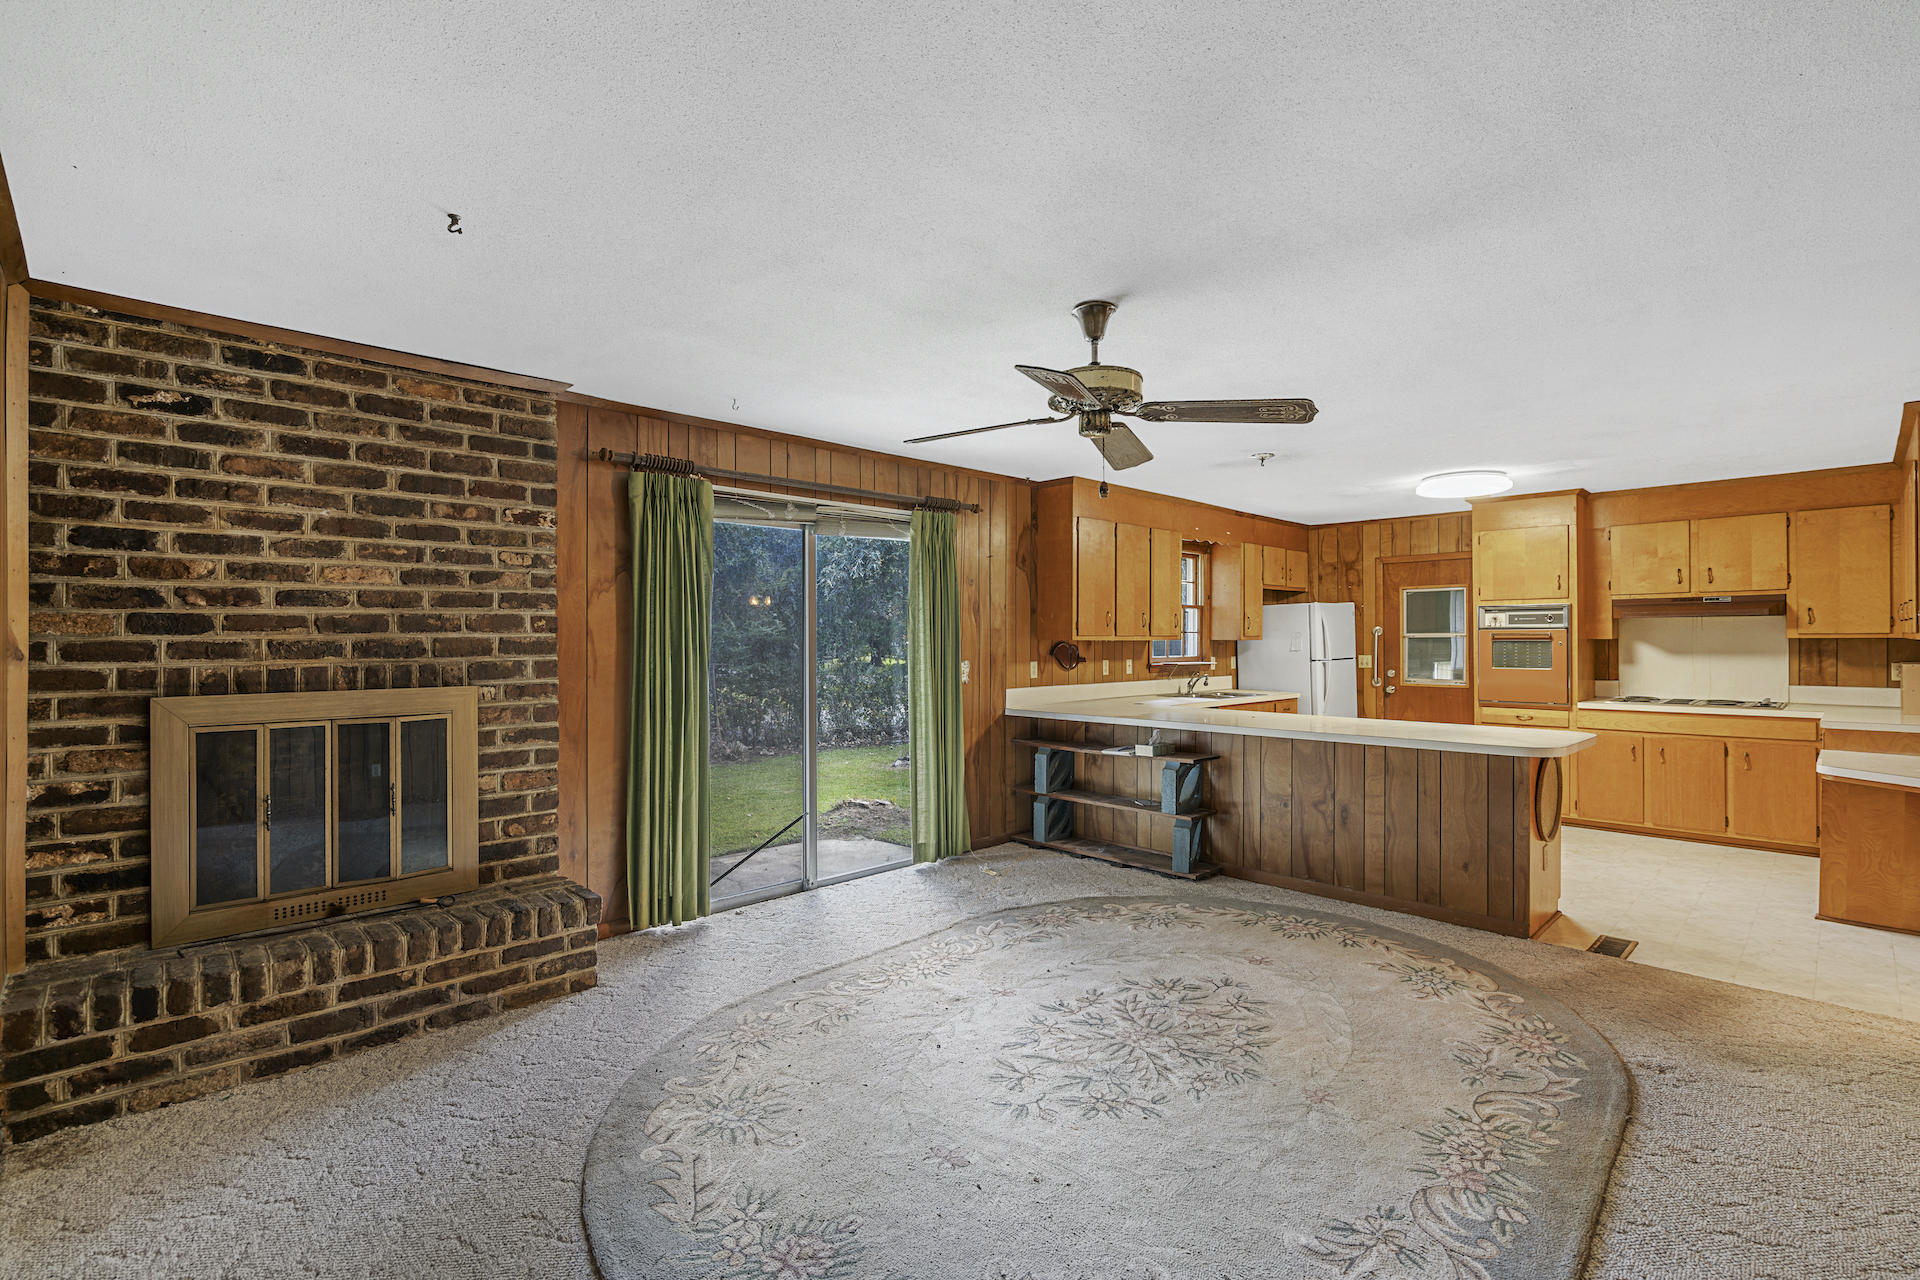 Charlestowne Estates I Homes For Sale - 1137 Culpepper, Charleston, SC - 6